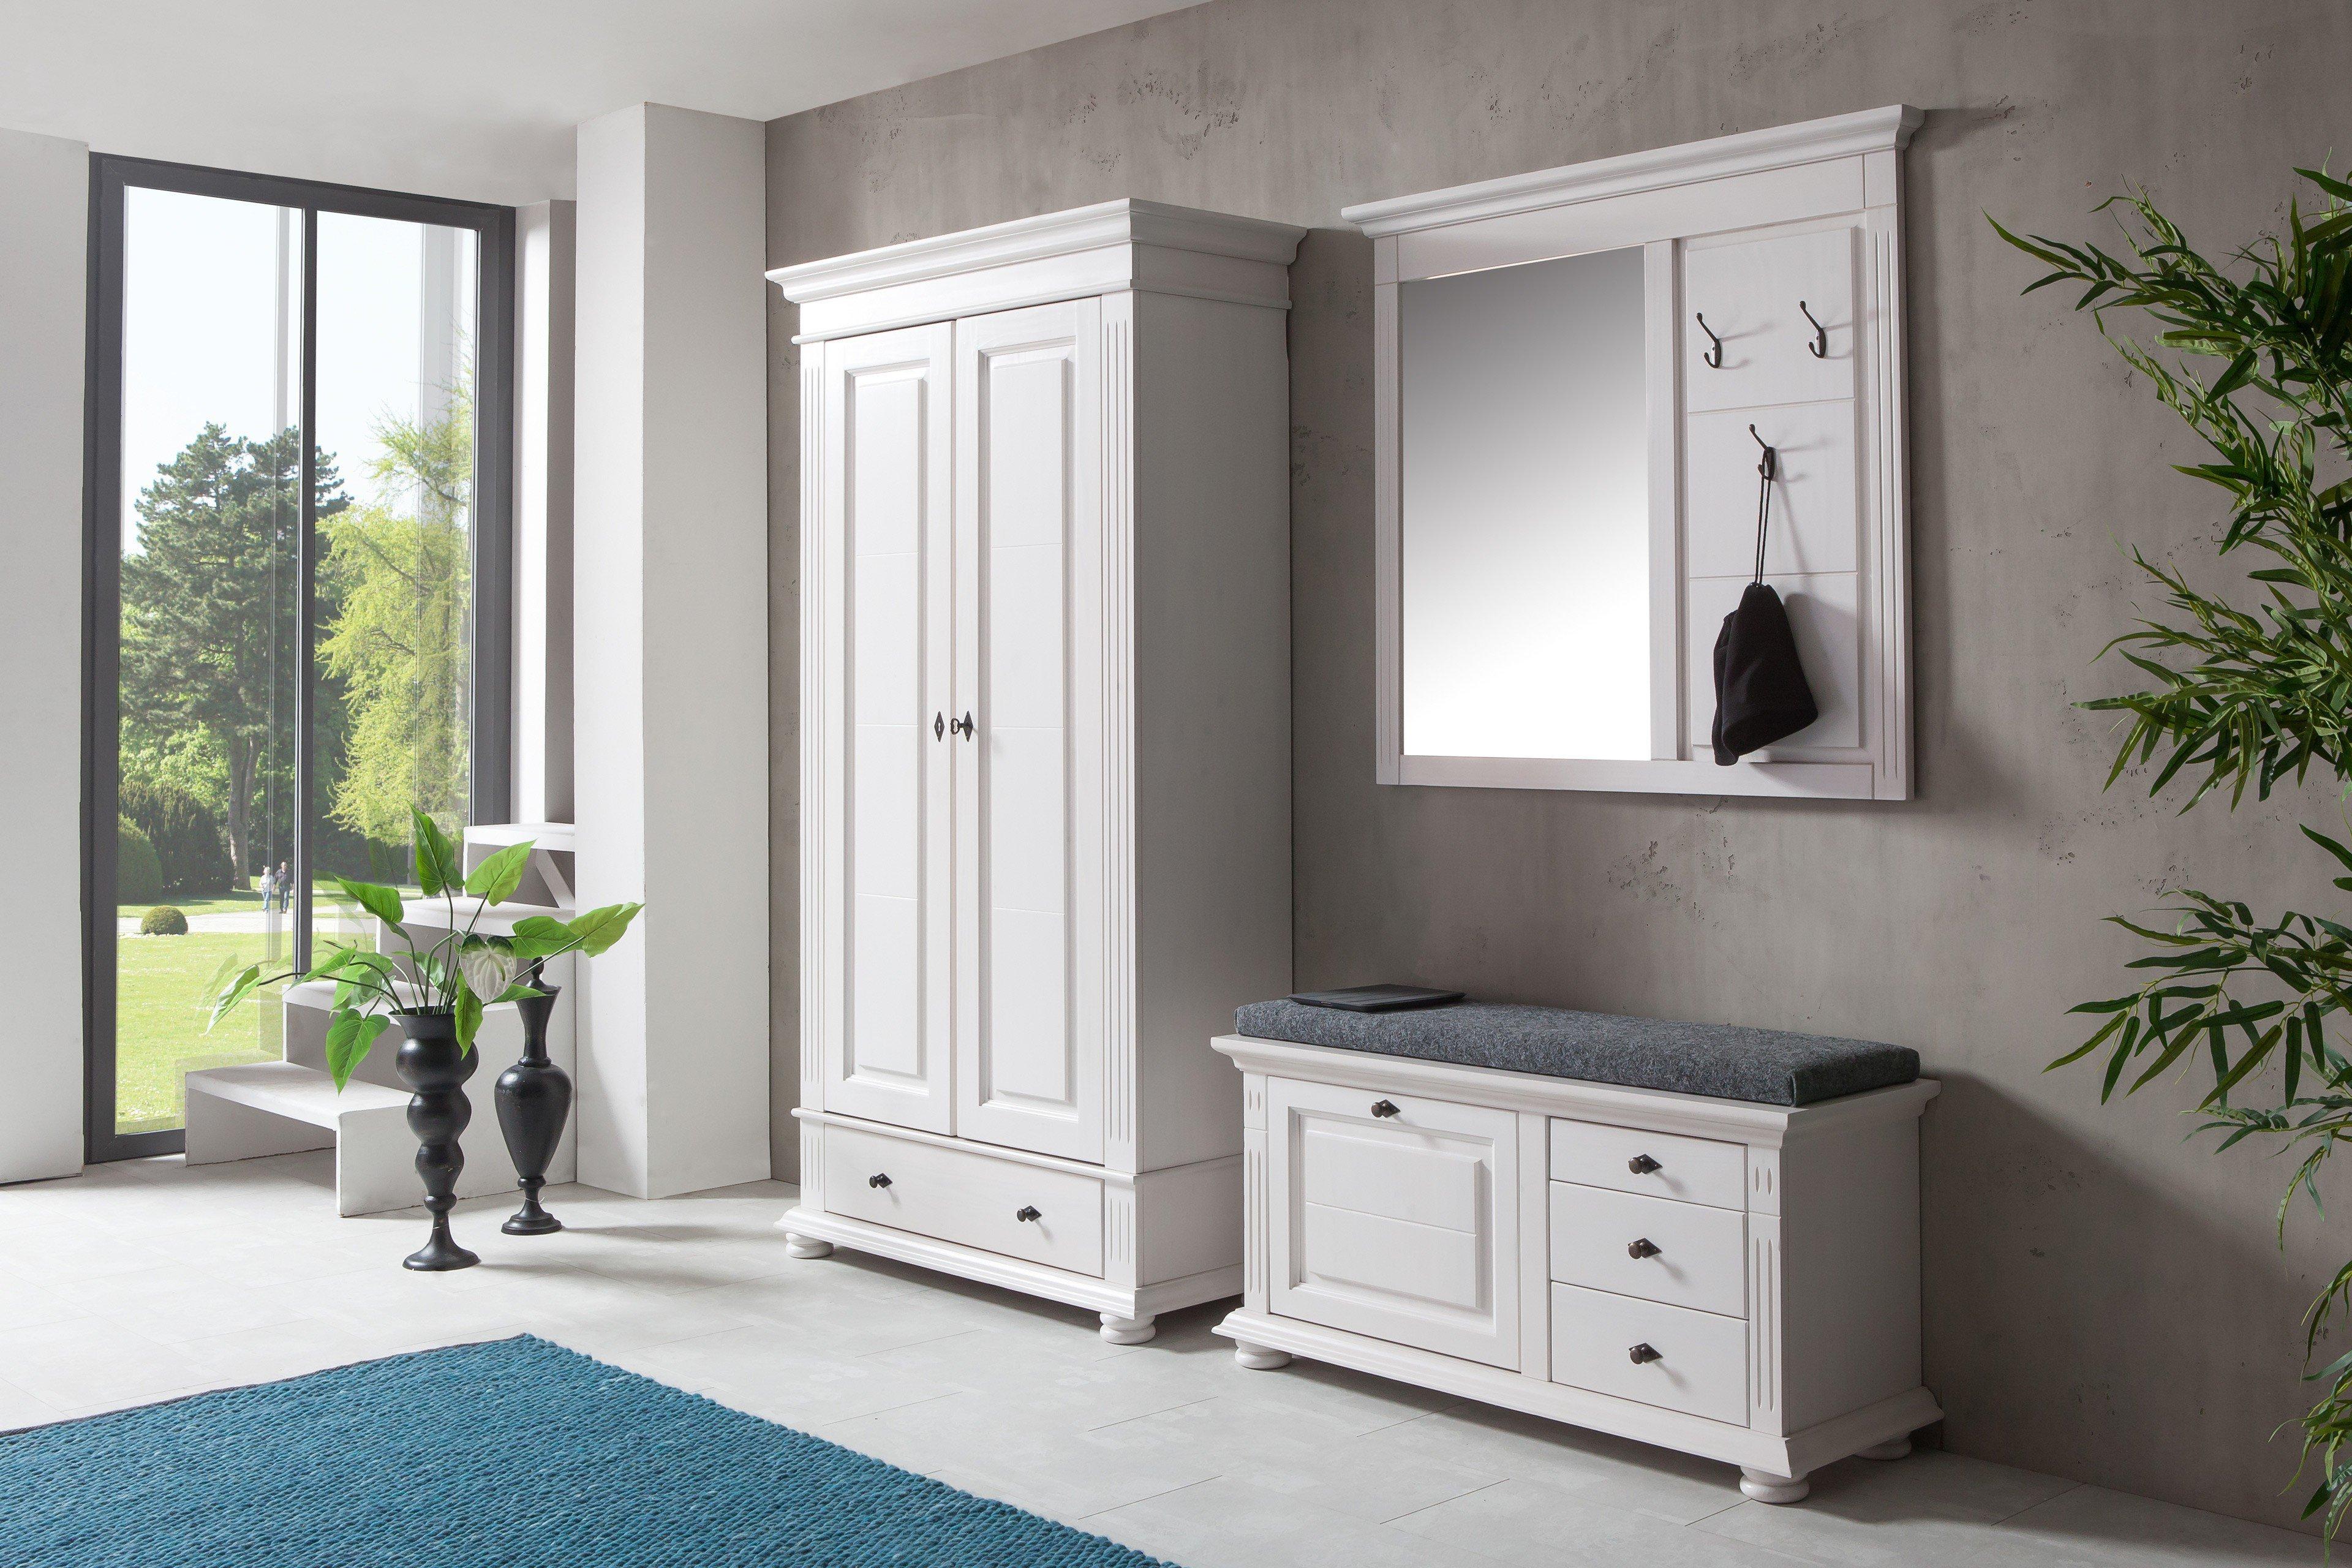 bfk m bel leona garderobe in astfichte m bel letz ihr online shop. Black Bedroom Furniture Sets. Home Design Ideas